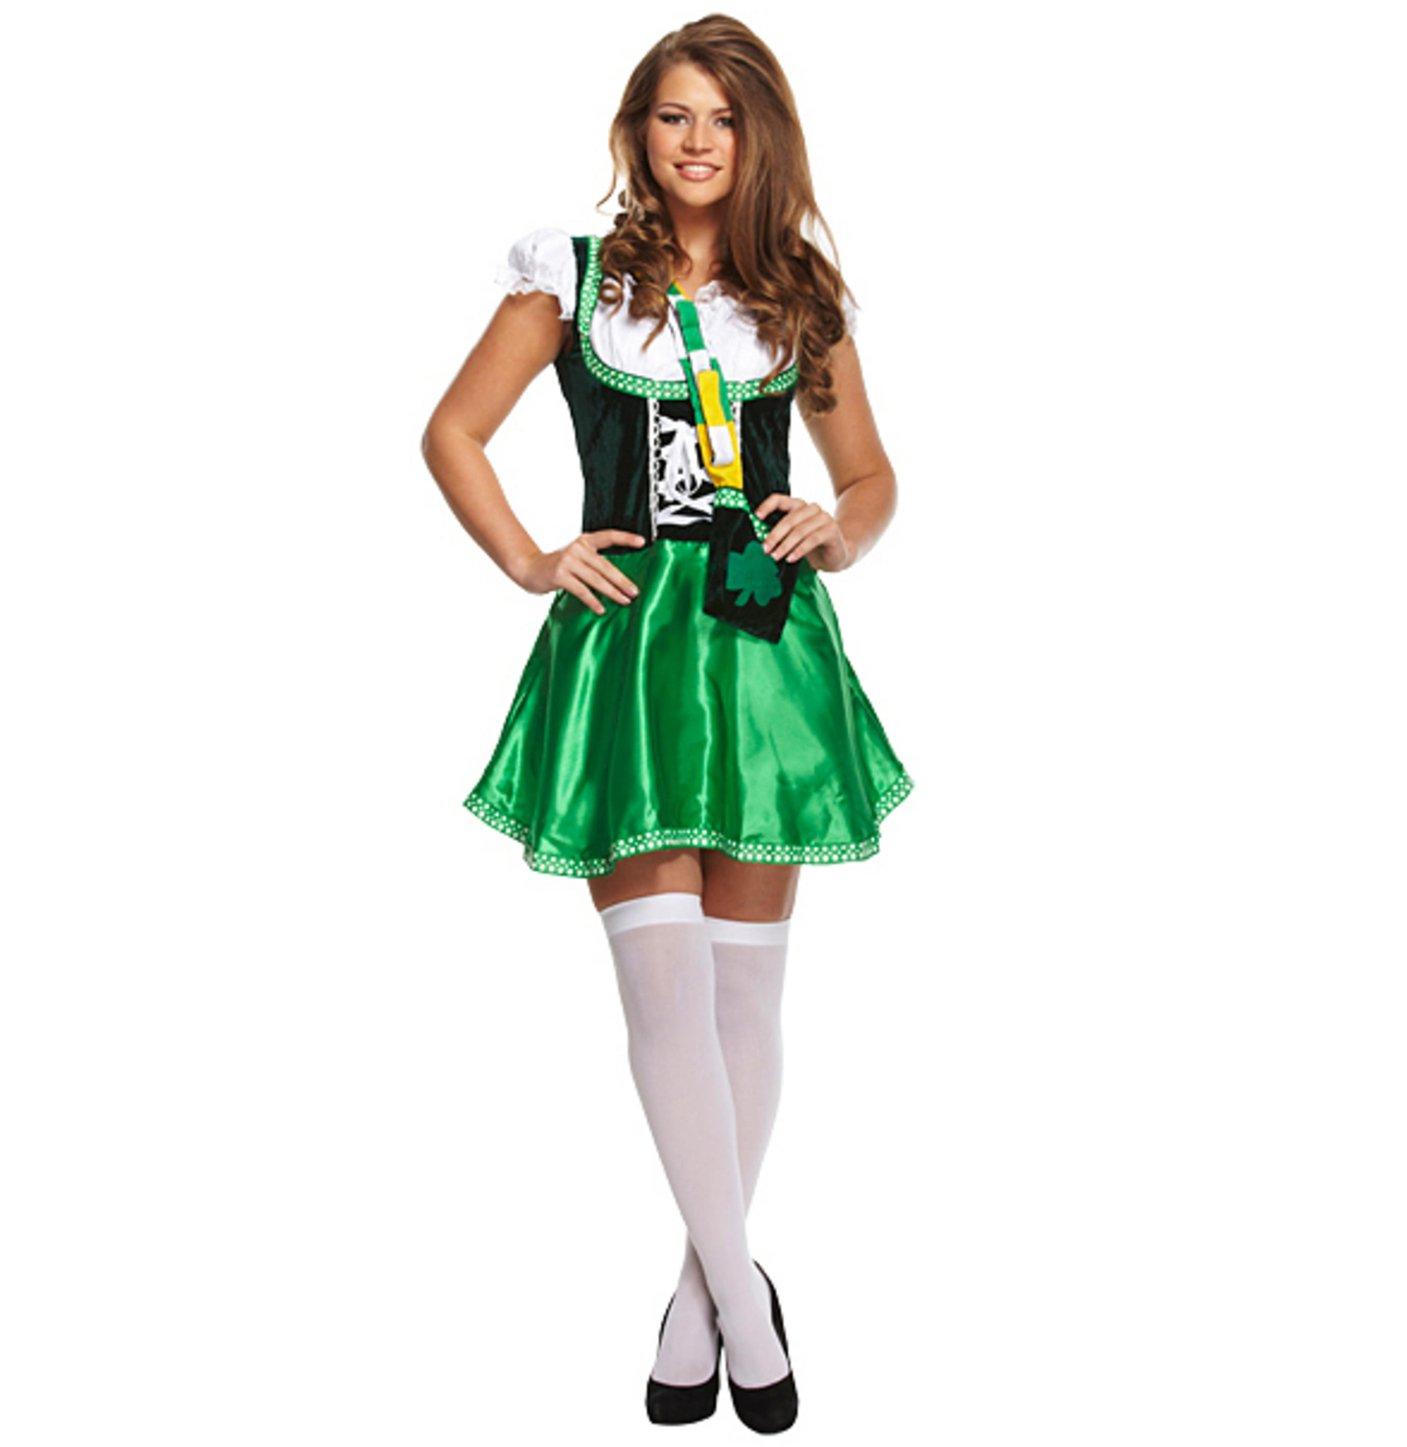 ladies fancy dress costume leprechaun g11188 irish st patricks day